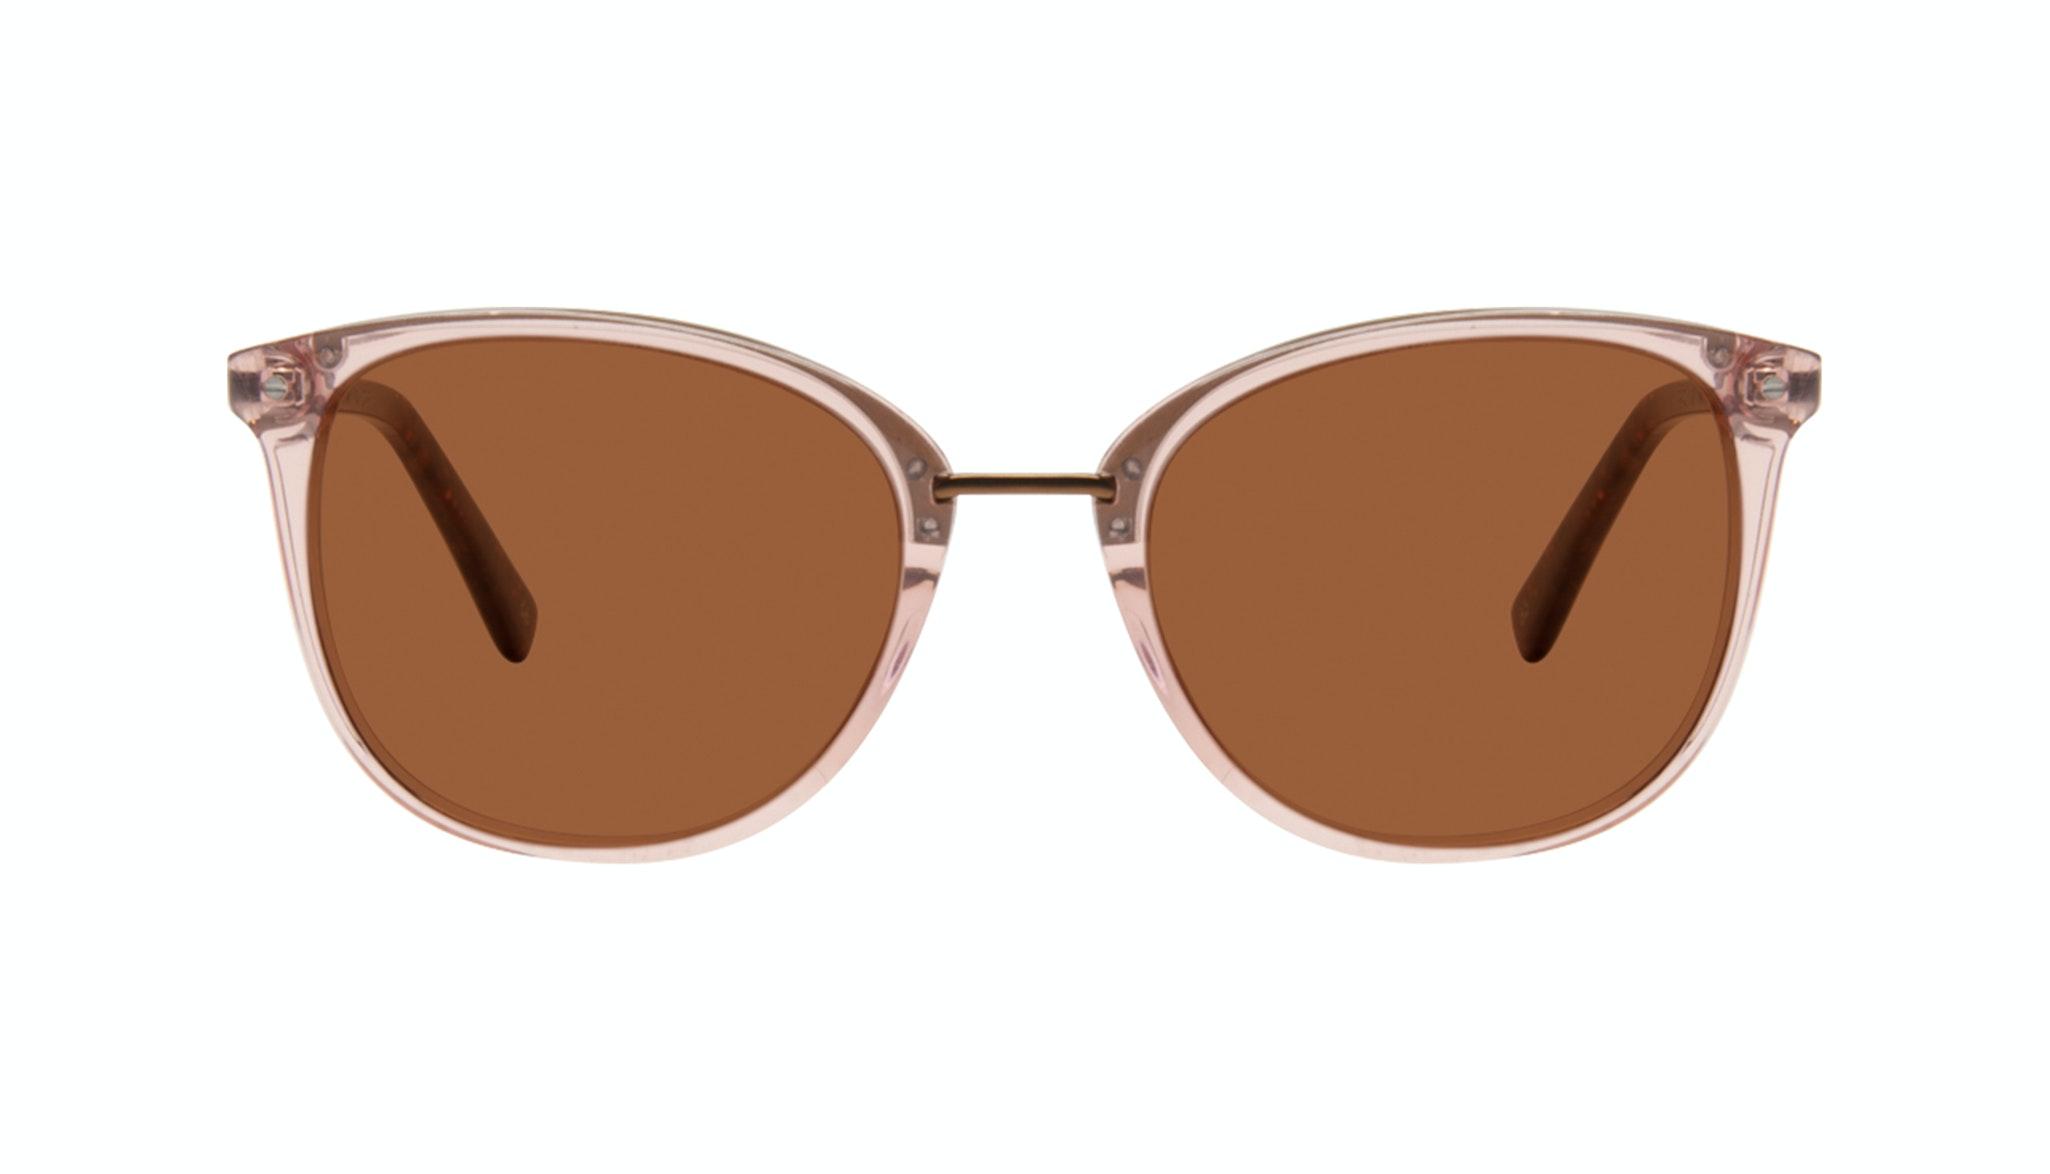 Affordable Fashion Glasses Square Round Sunglasses Women Bella Rose Front